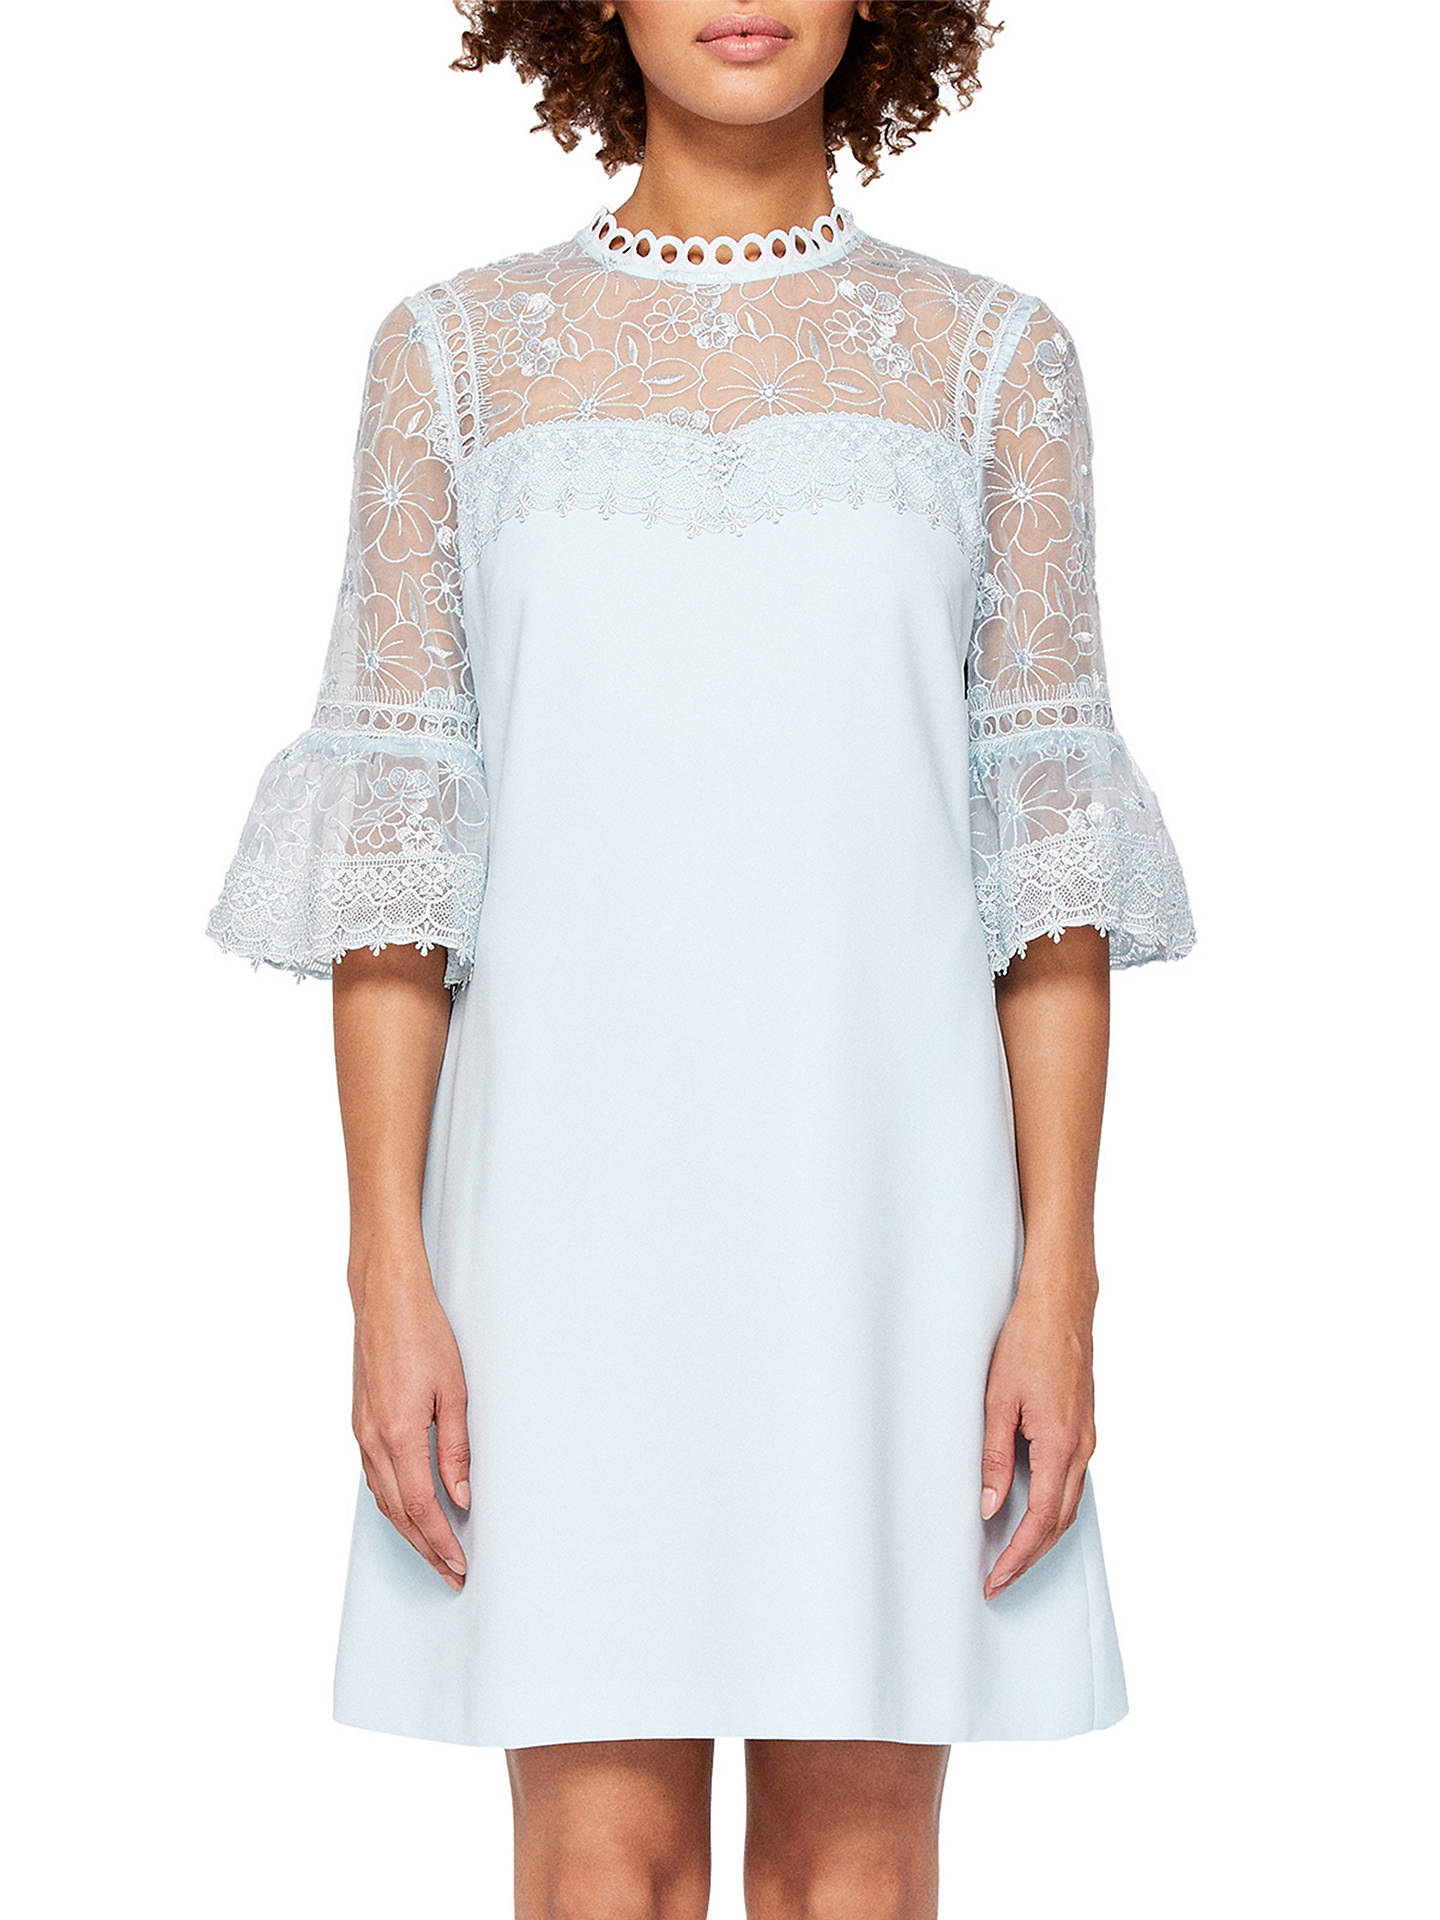 Ted Baker Raechal Lace Peplum Dress At John Lewis Amp Partners